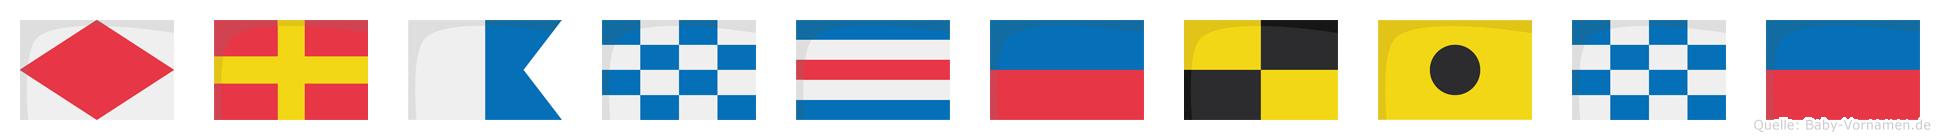 Franceline im Flaggenalphabet